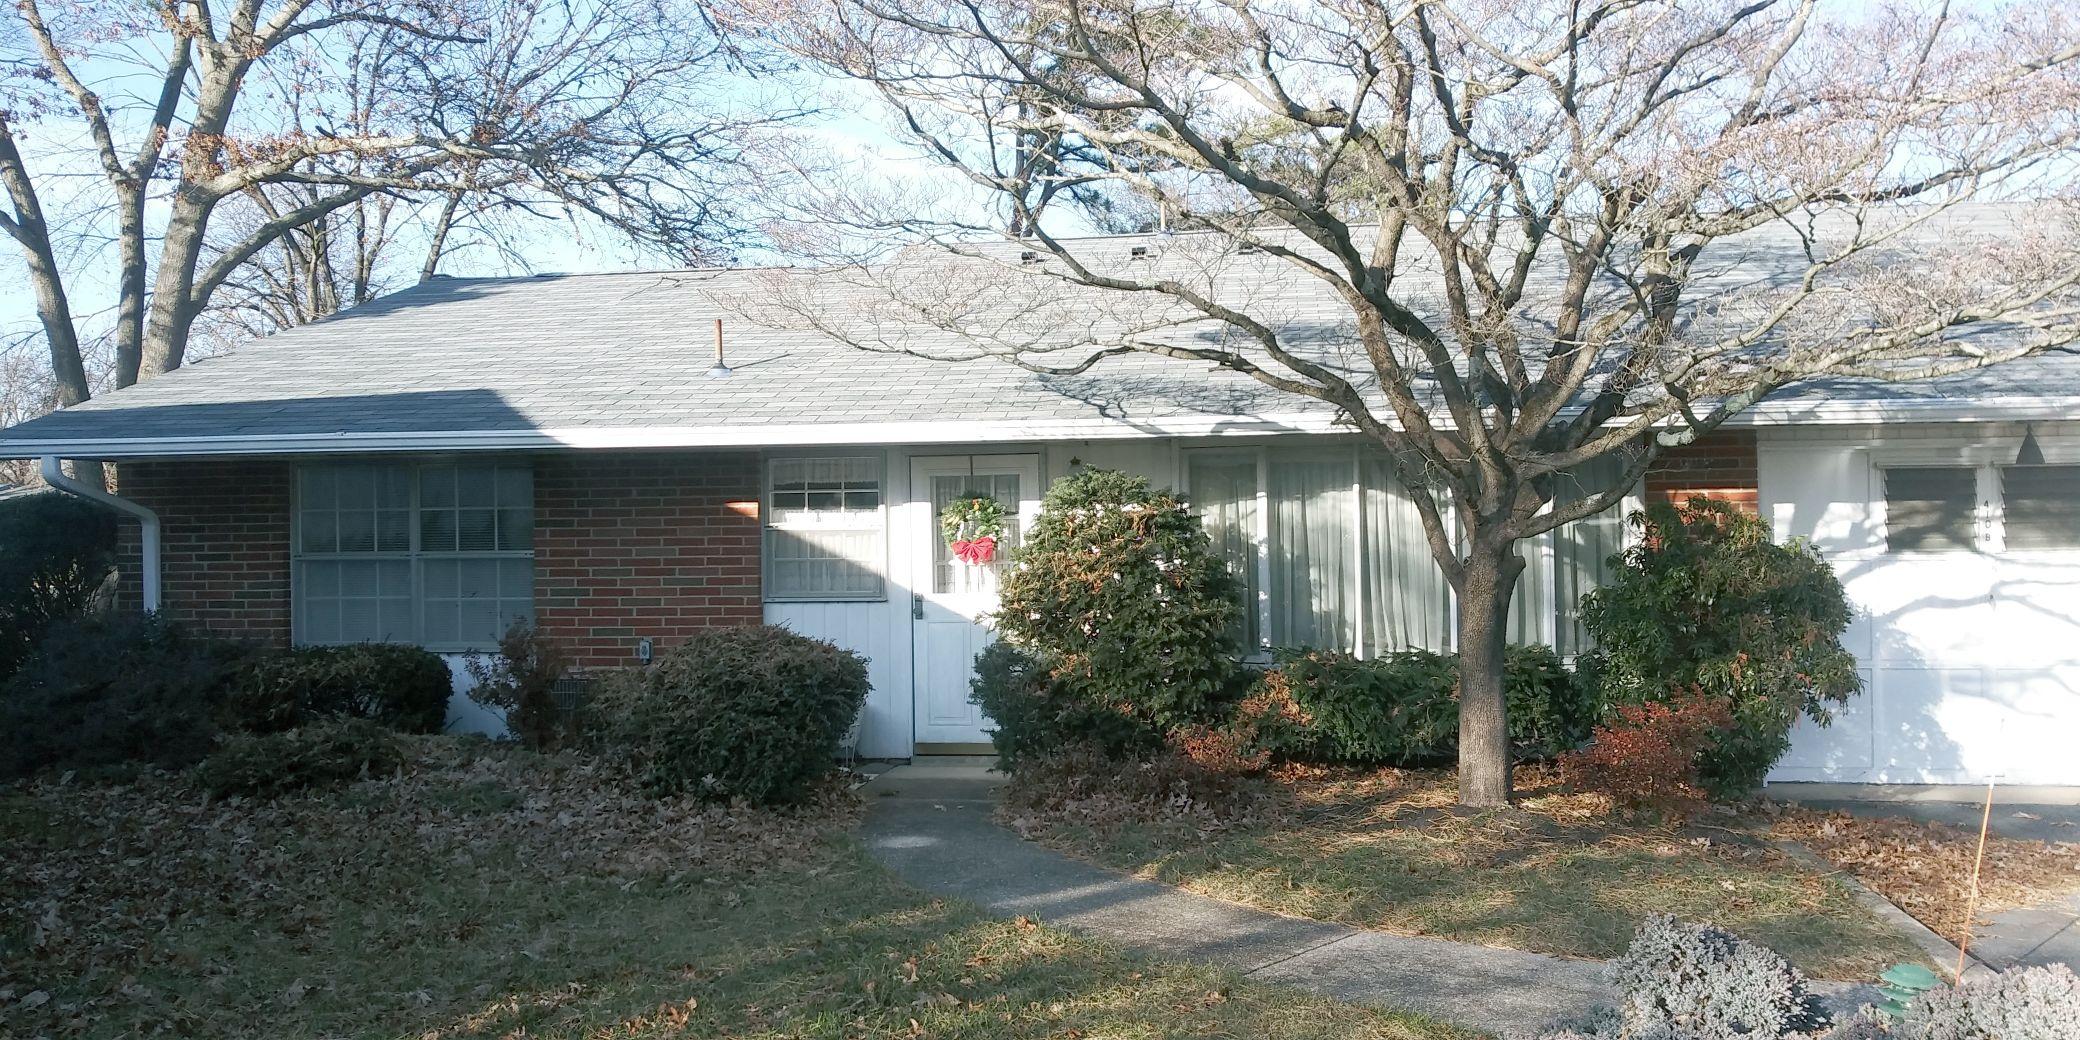 410 Portsmouth Dr, Lakewood Township, NJ